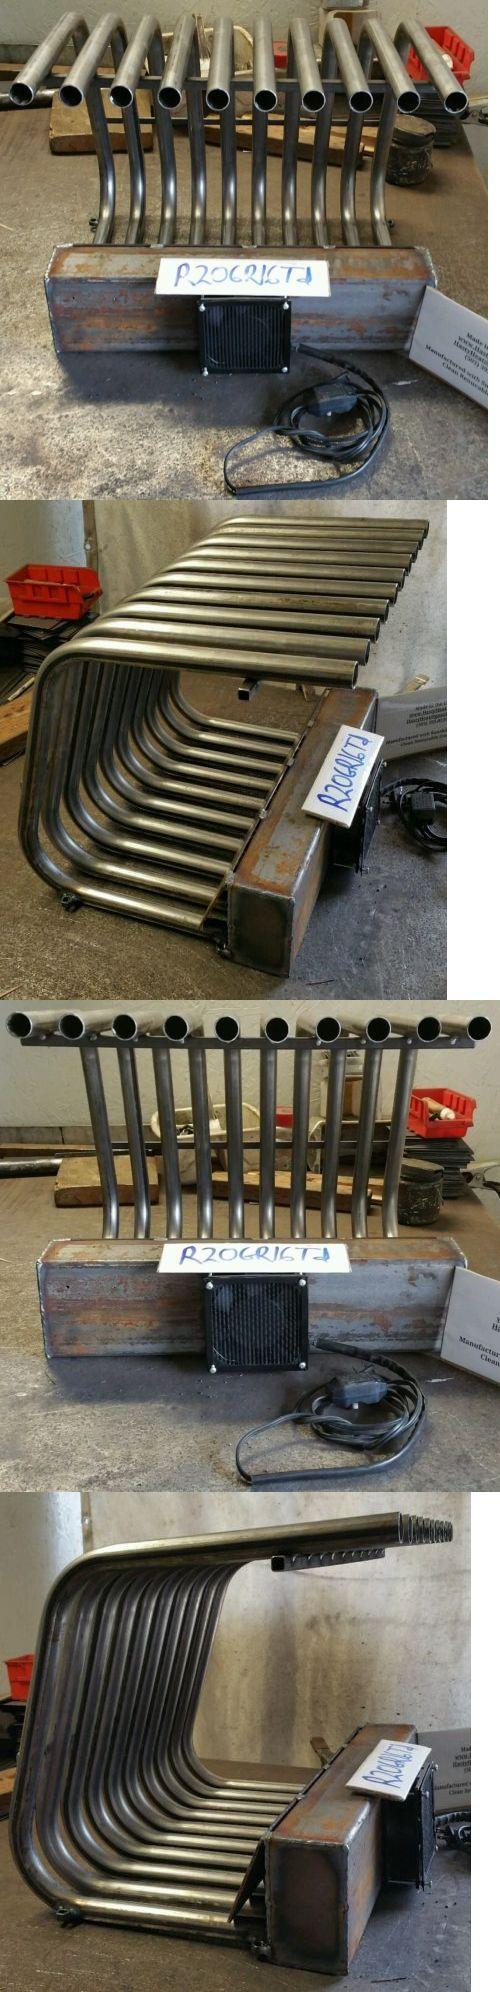 Andirons Grates and Firedogs 79648: R20gr16td Heat Exchanger Fireplace Furnace Heatilator Fireback Grate Heat Blower -> BUY IT NOW ONLY: $460 on eBay!